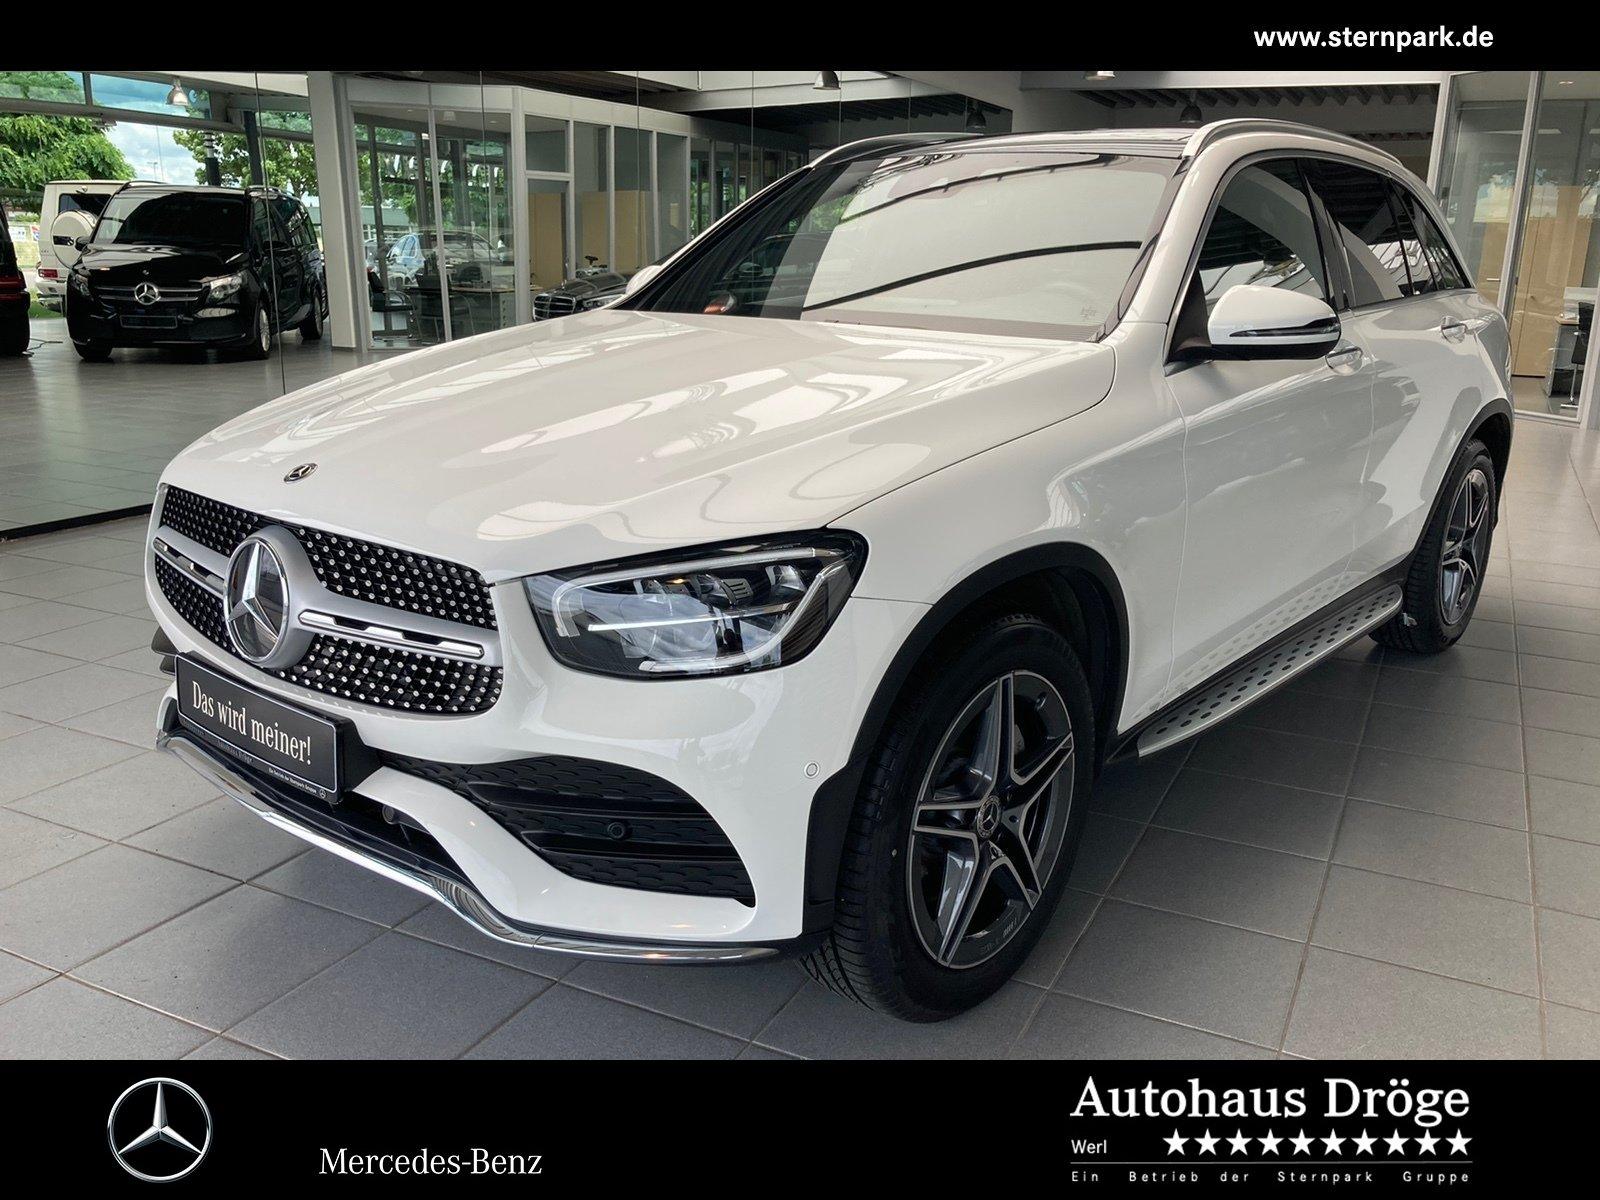 Mercedes-Benz GLC 300 4M AMG Pano*Distronic*LED*Kamera*Spur*19, Jahr 2019, Benzin